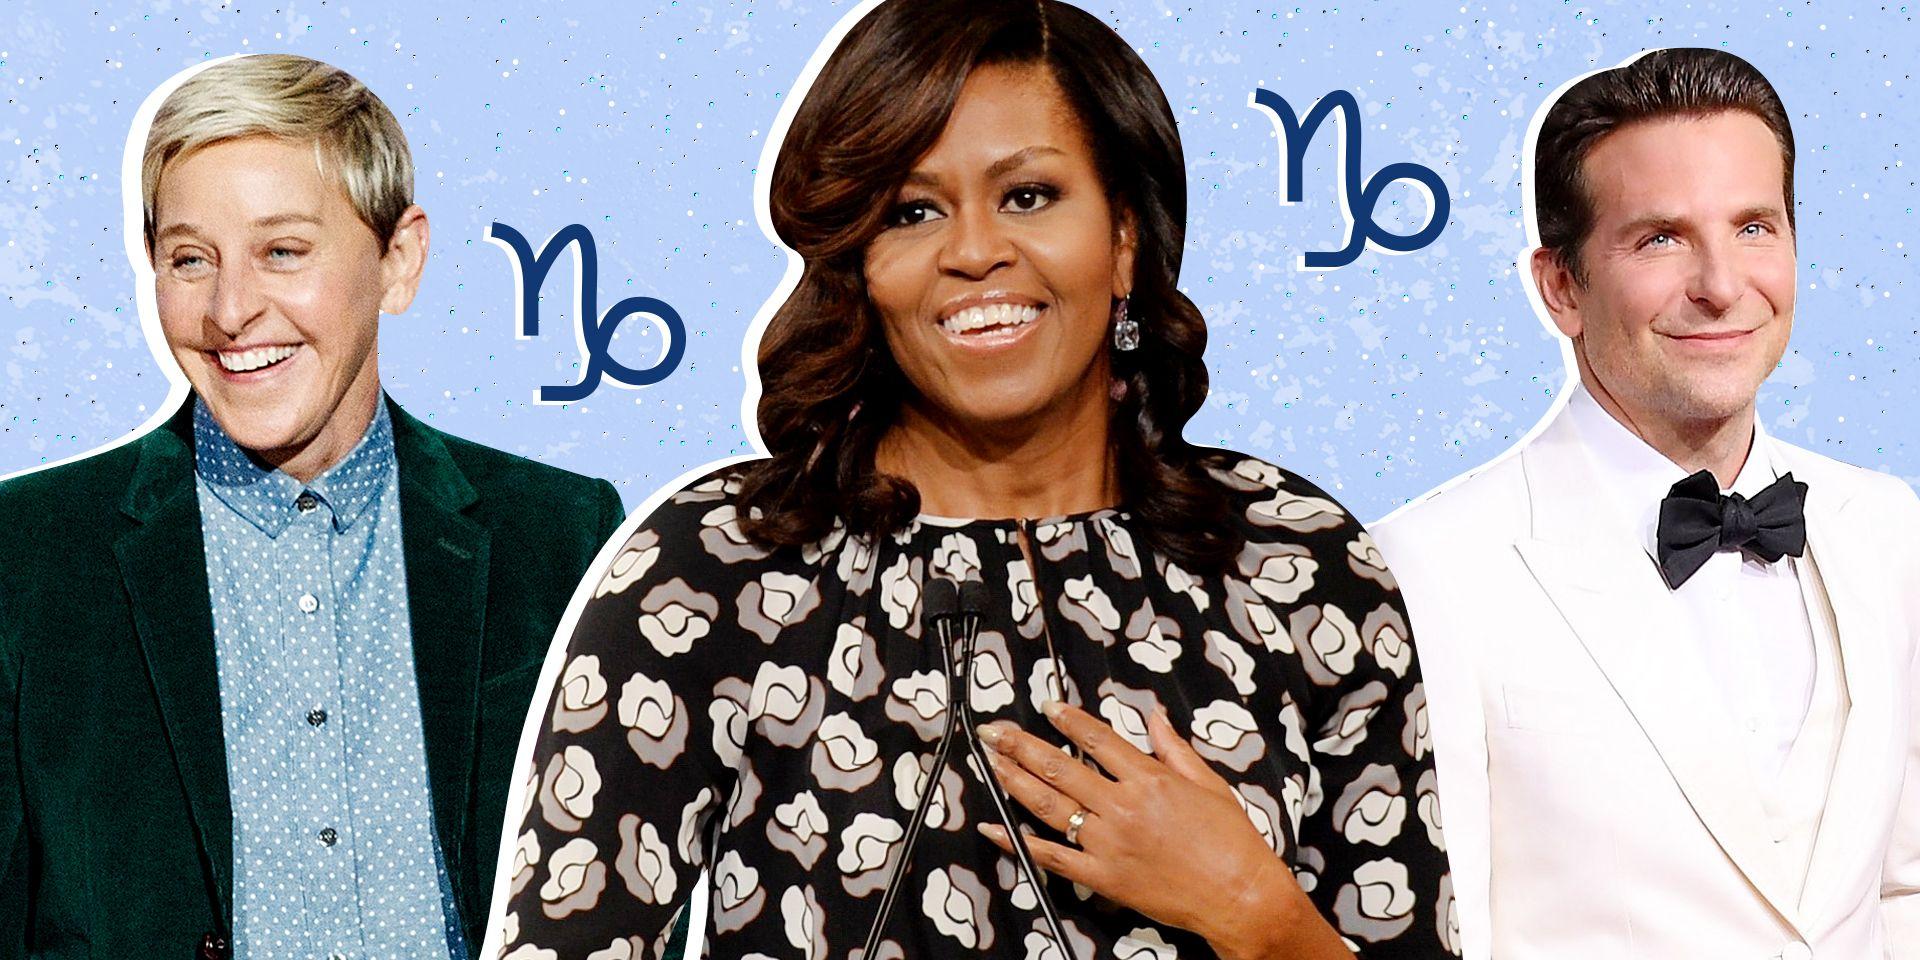 10 Capricorn Celebrities Celebrities That Are Capricorns,Barefoot Contessa Pioneer Woman Meatloaf Recipe